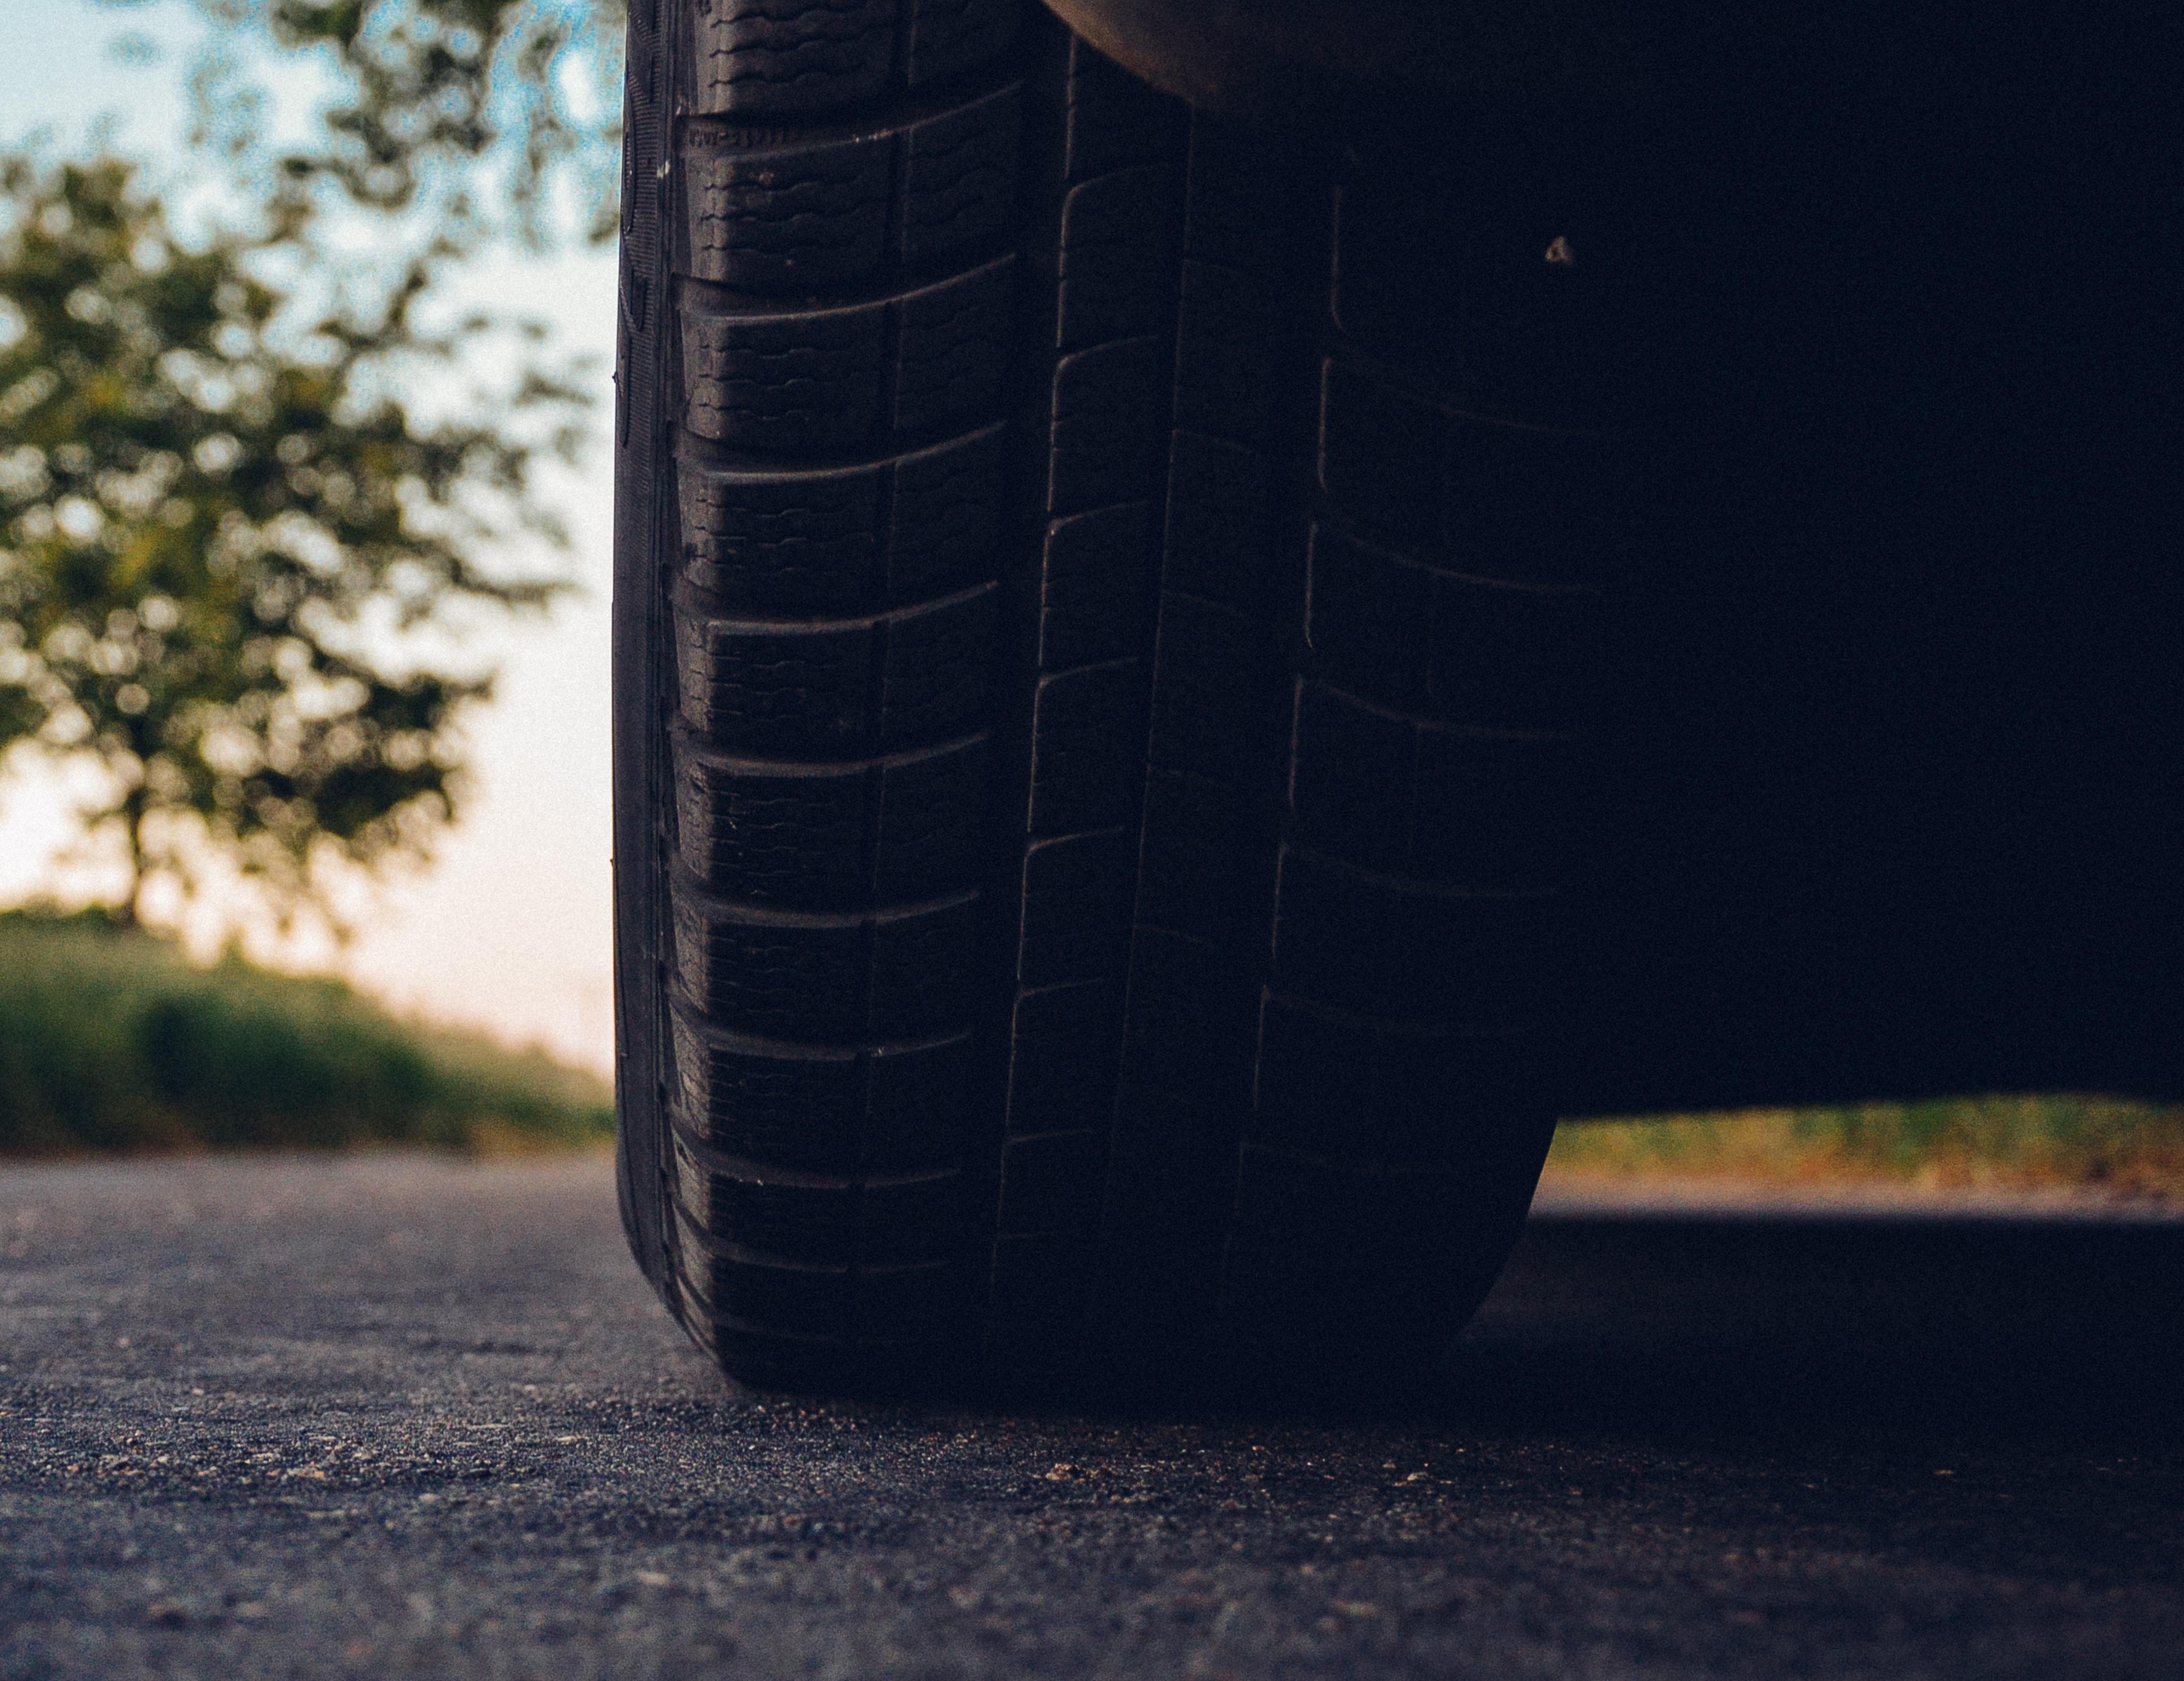 road-car-tire.jpg